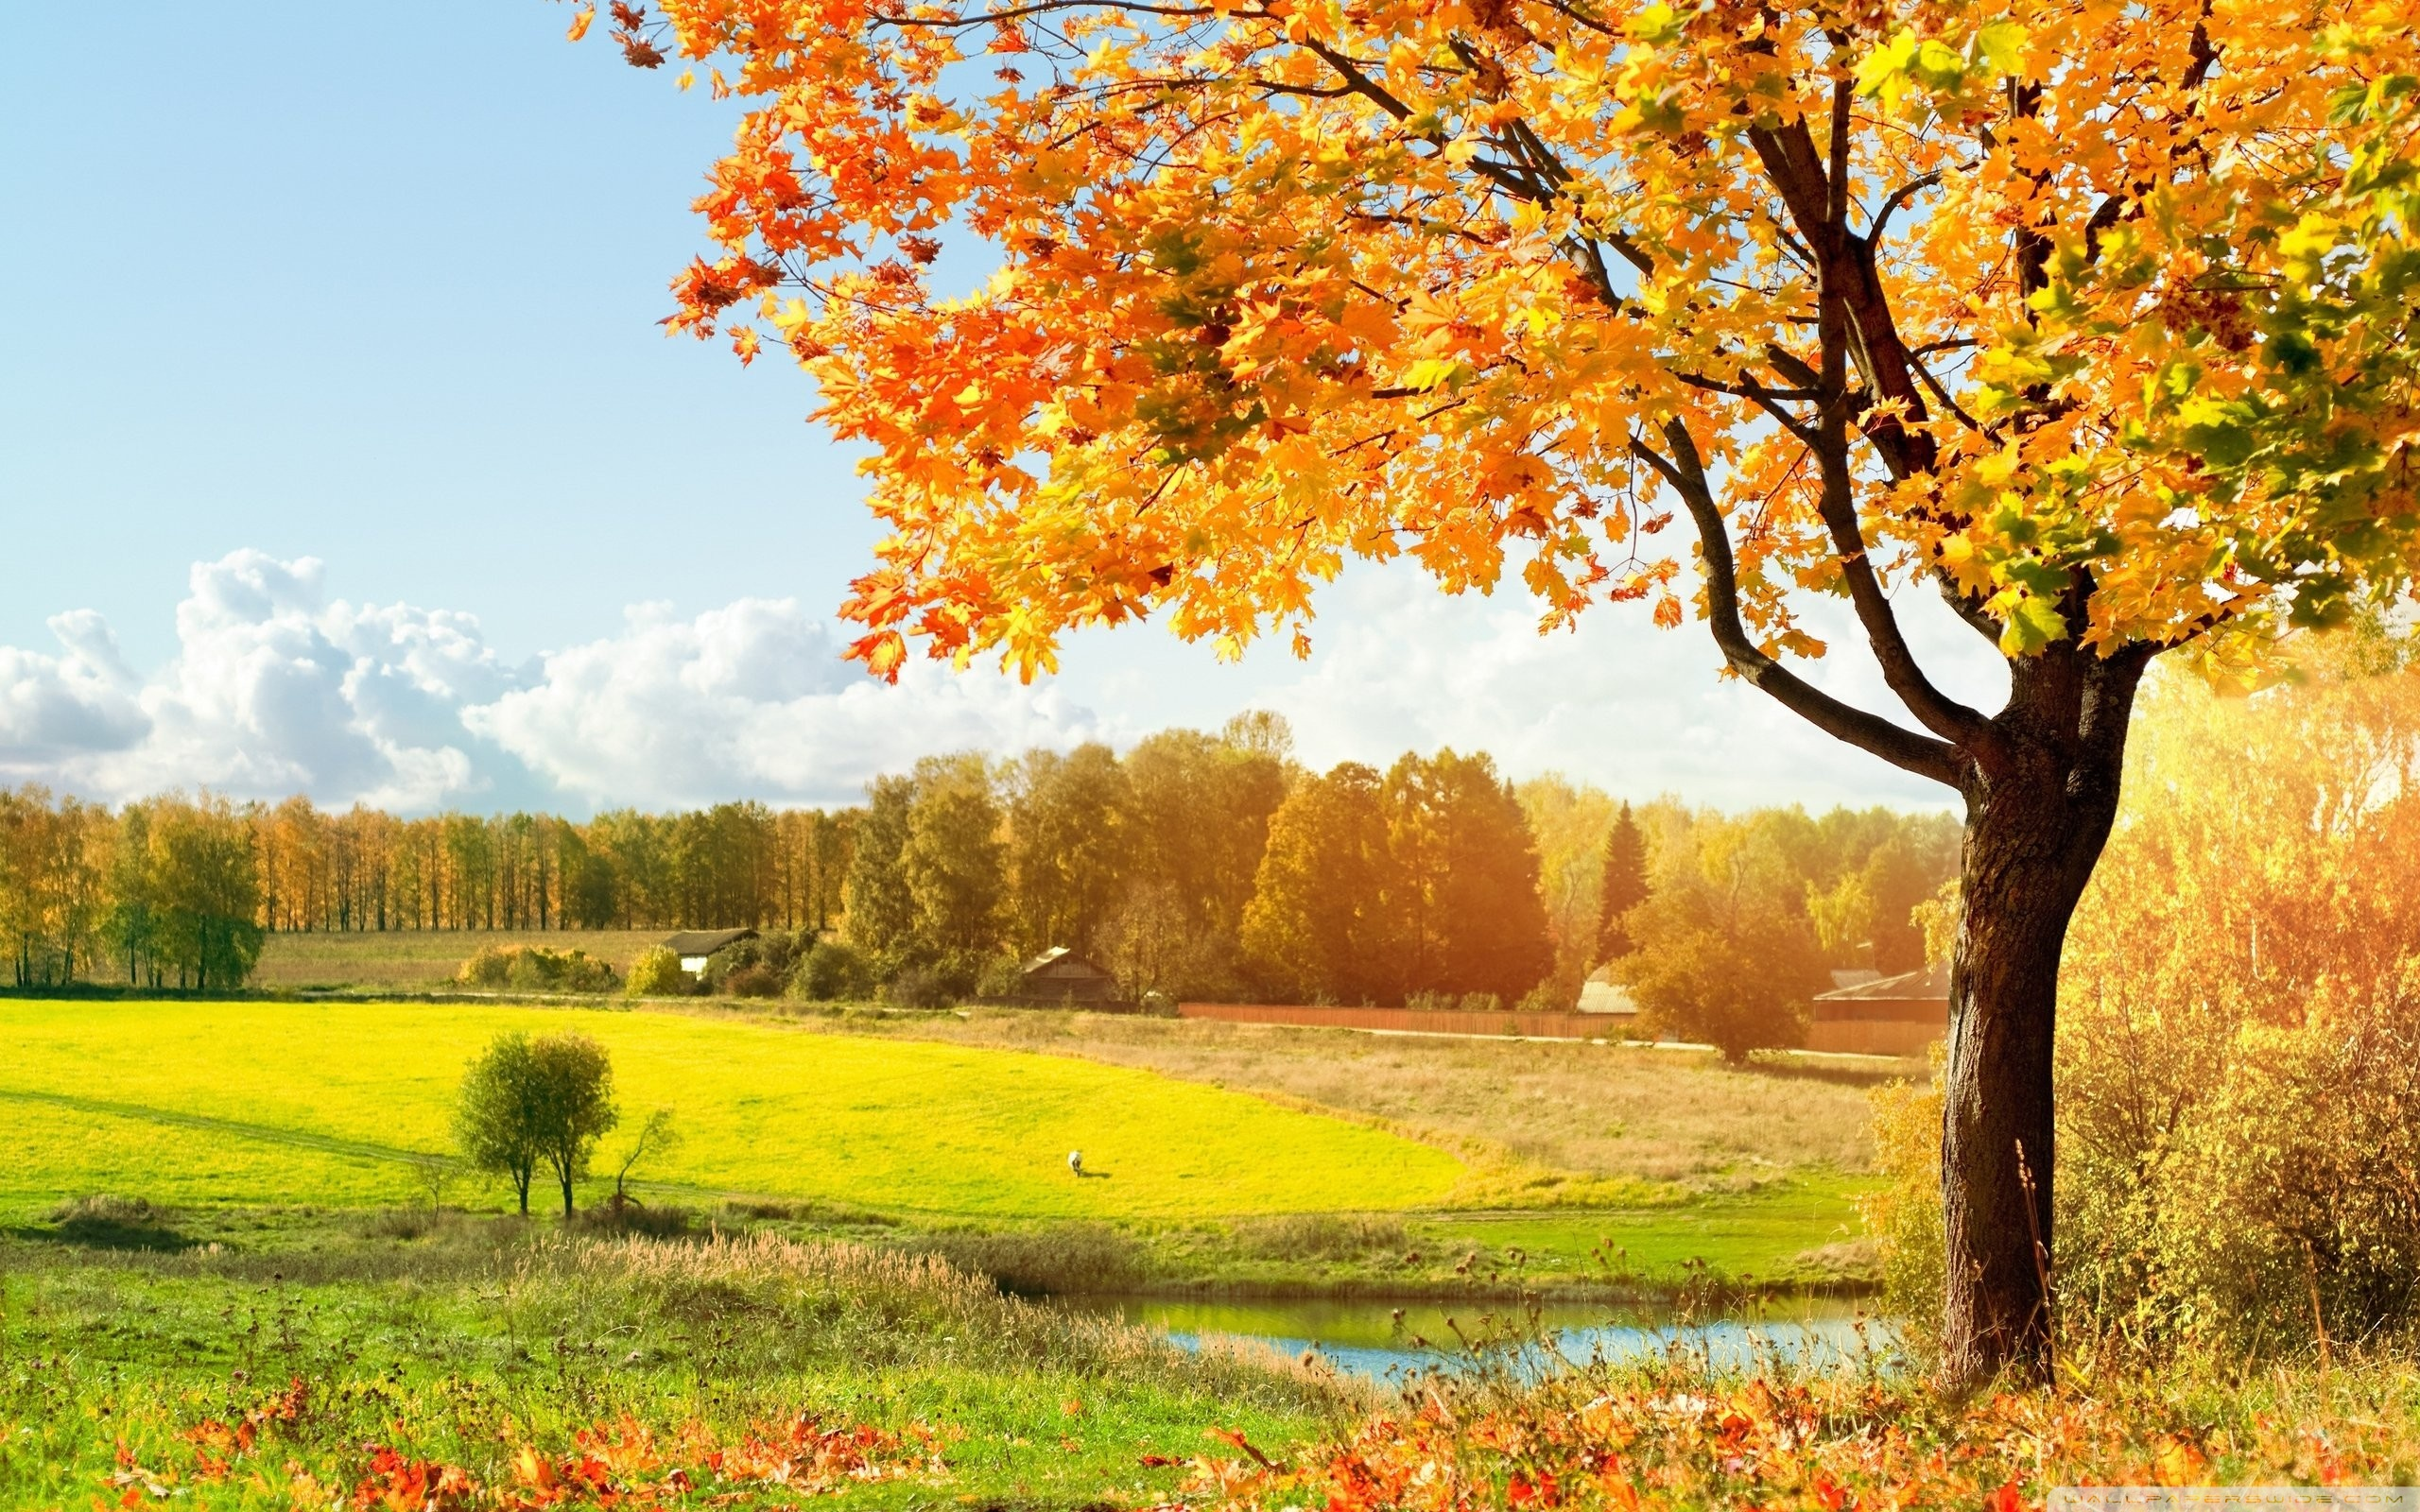 Осень, времена года, природа, поле, дерево, HD